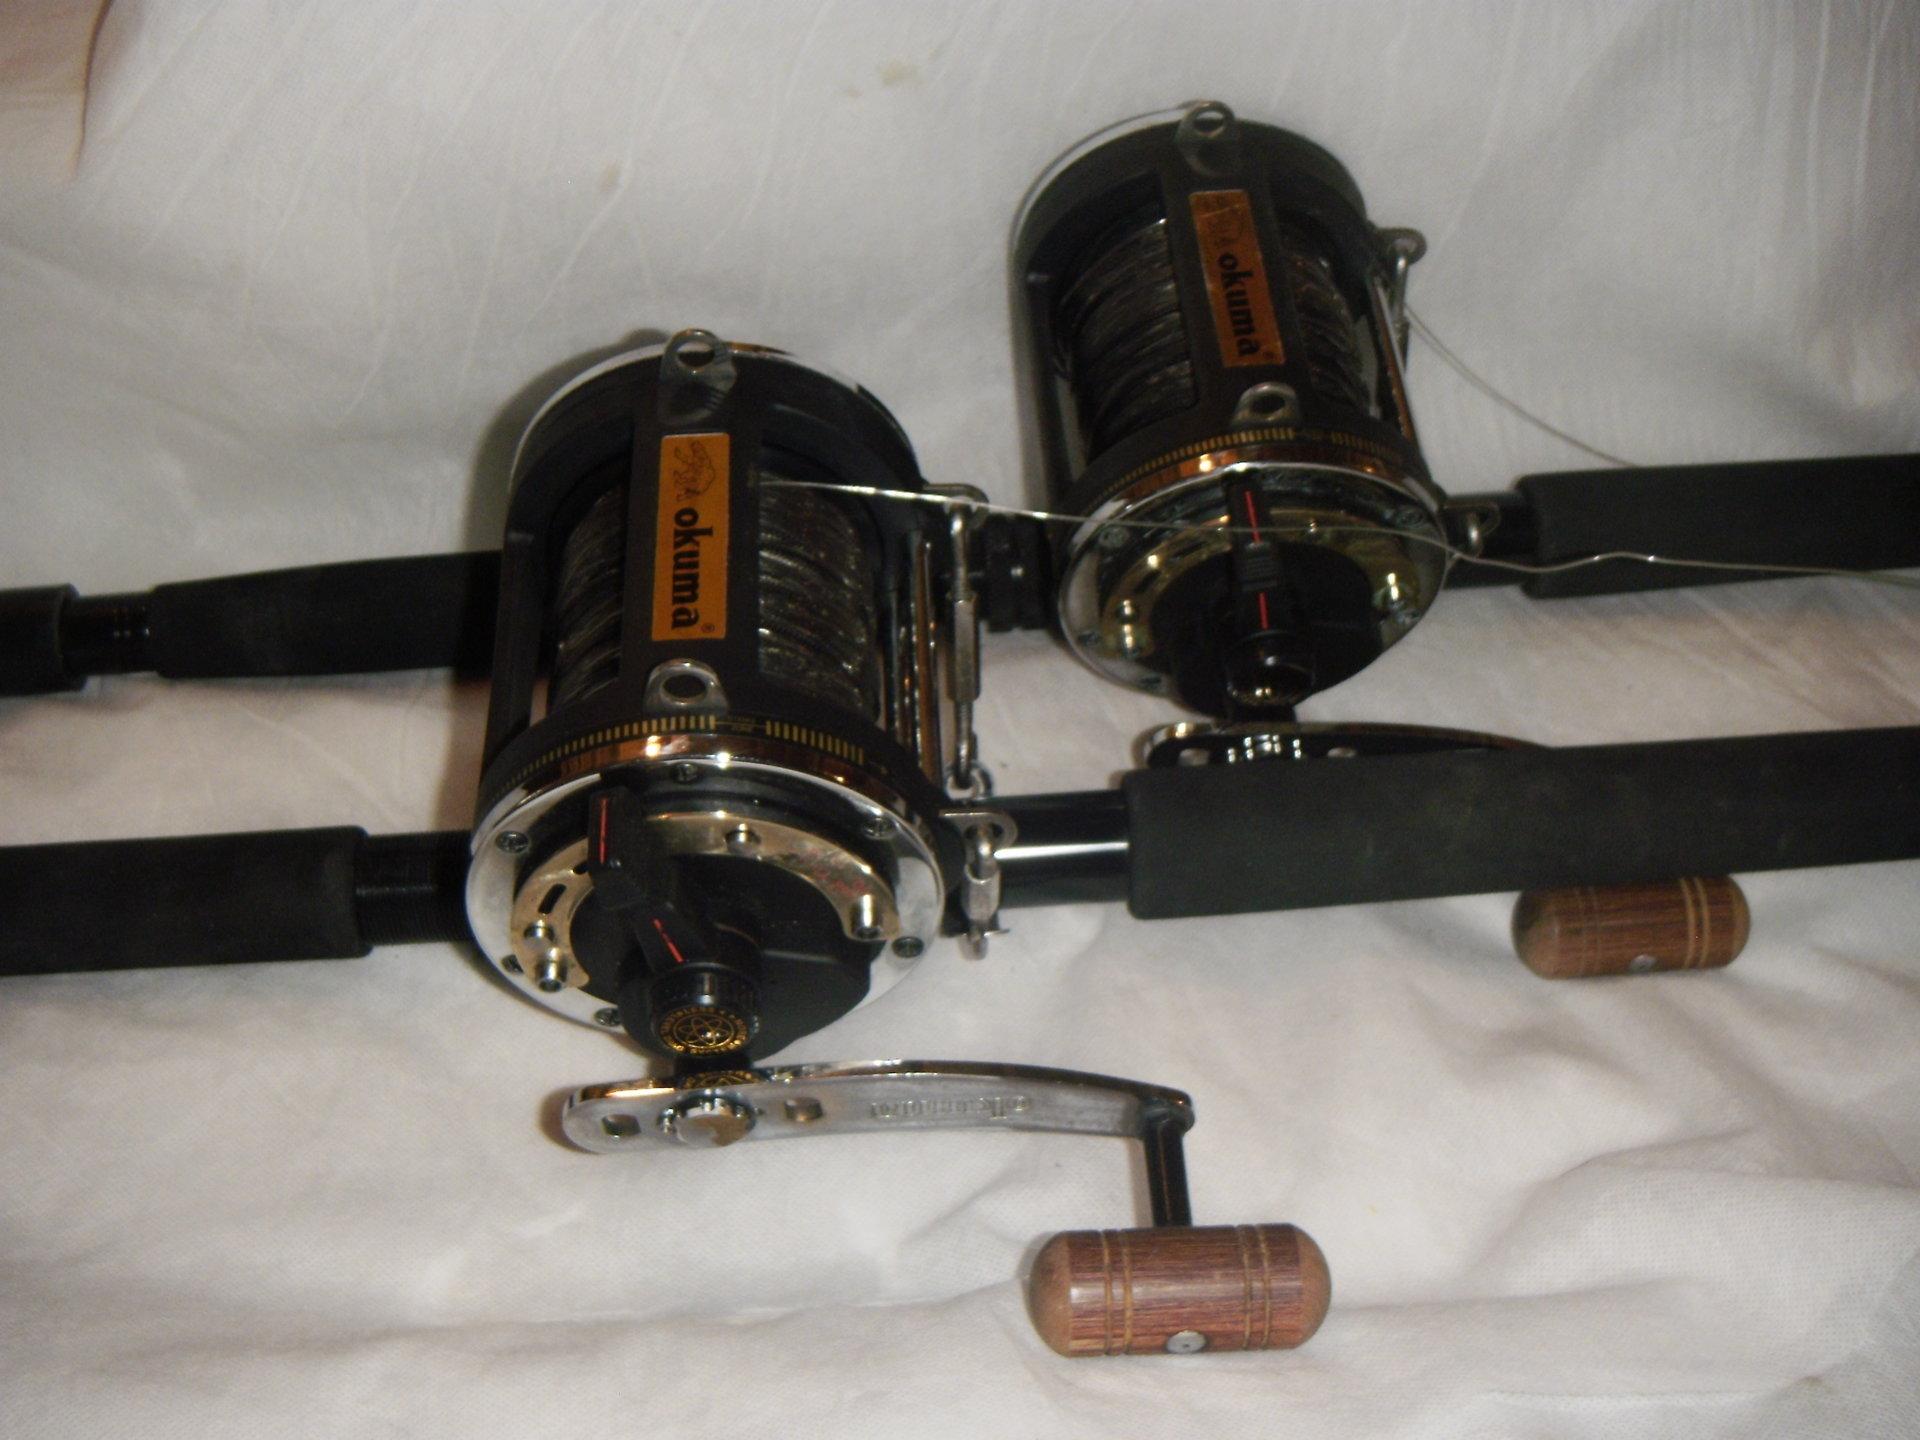 OKUMA 80W Lever Drag Reelson  Shakespeare Fishing Rods BWSU1150130     Just $800. pair pic 001.JPG